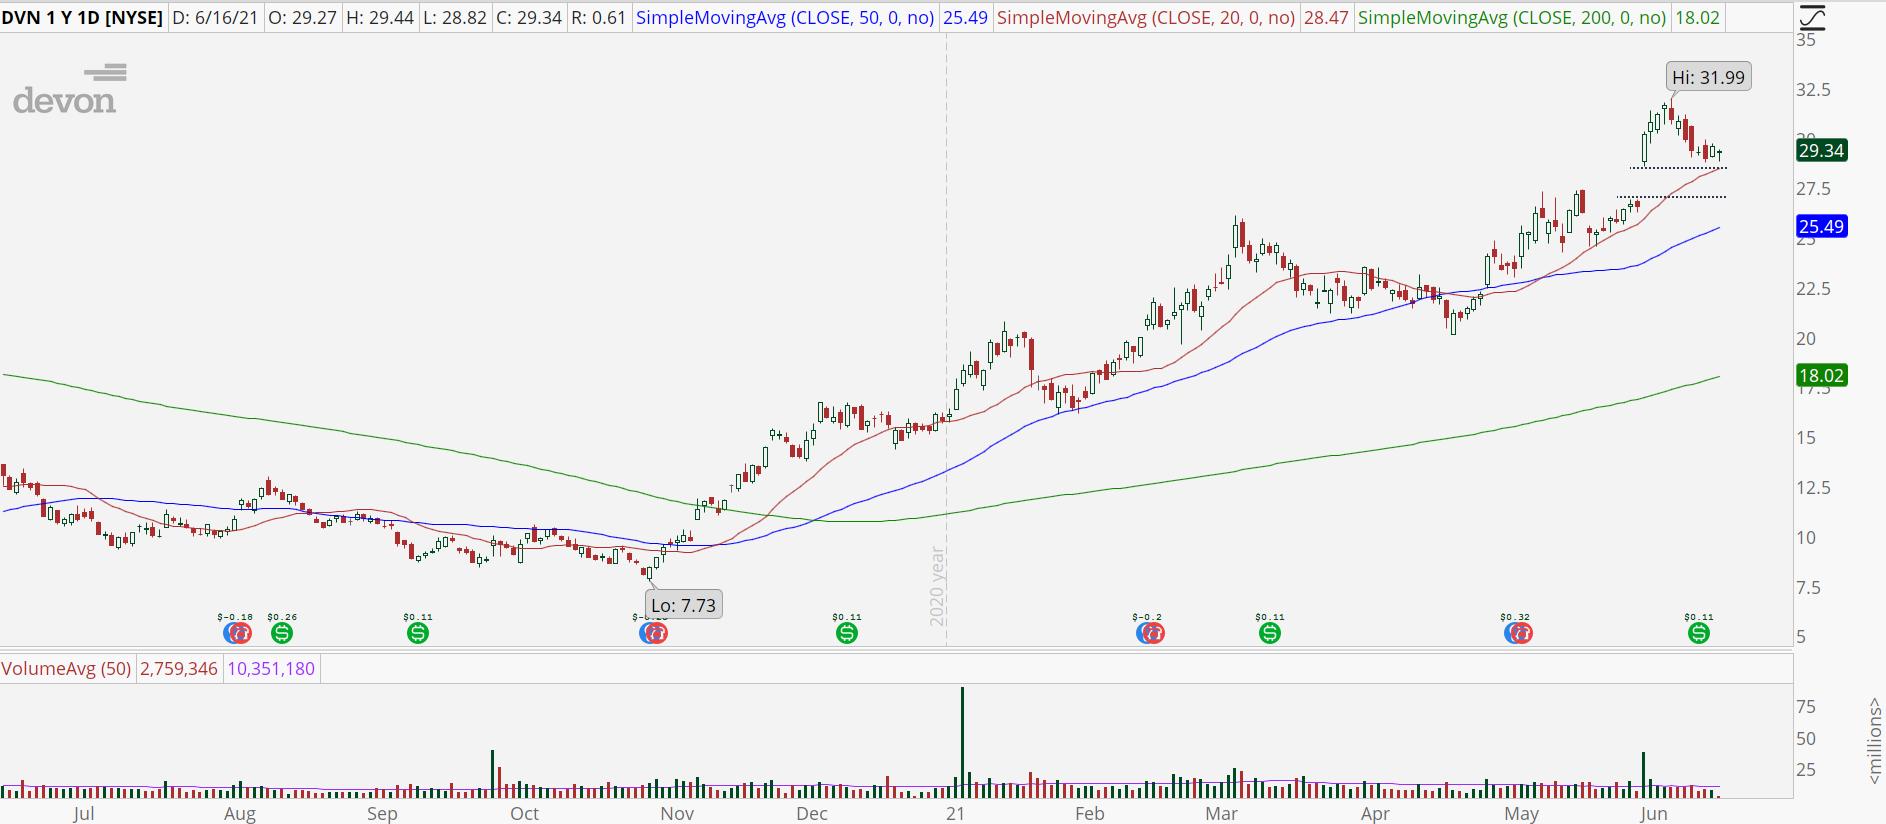 Devon Energy (DVN) stock chart with bull retracement pattern